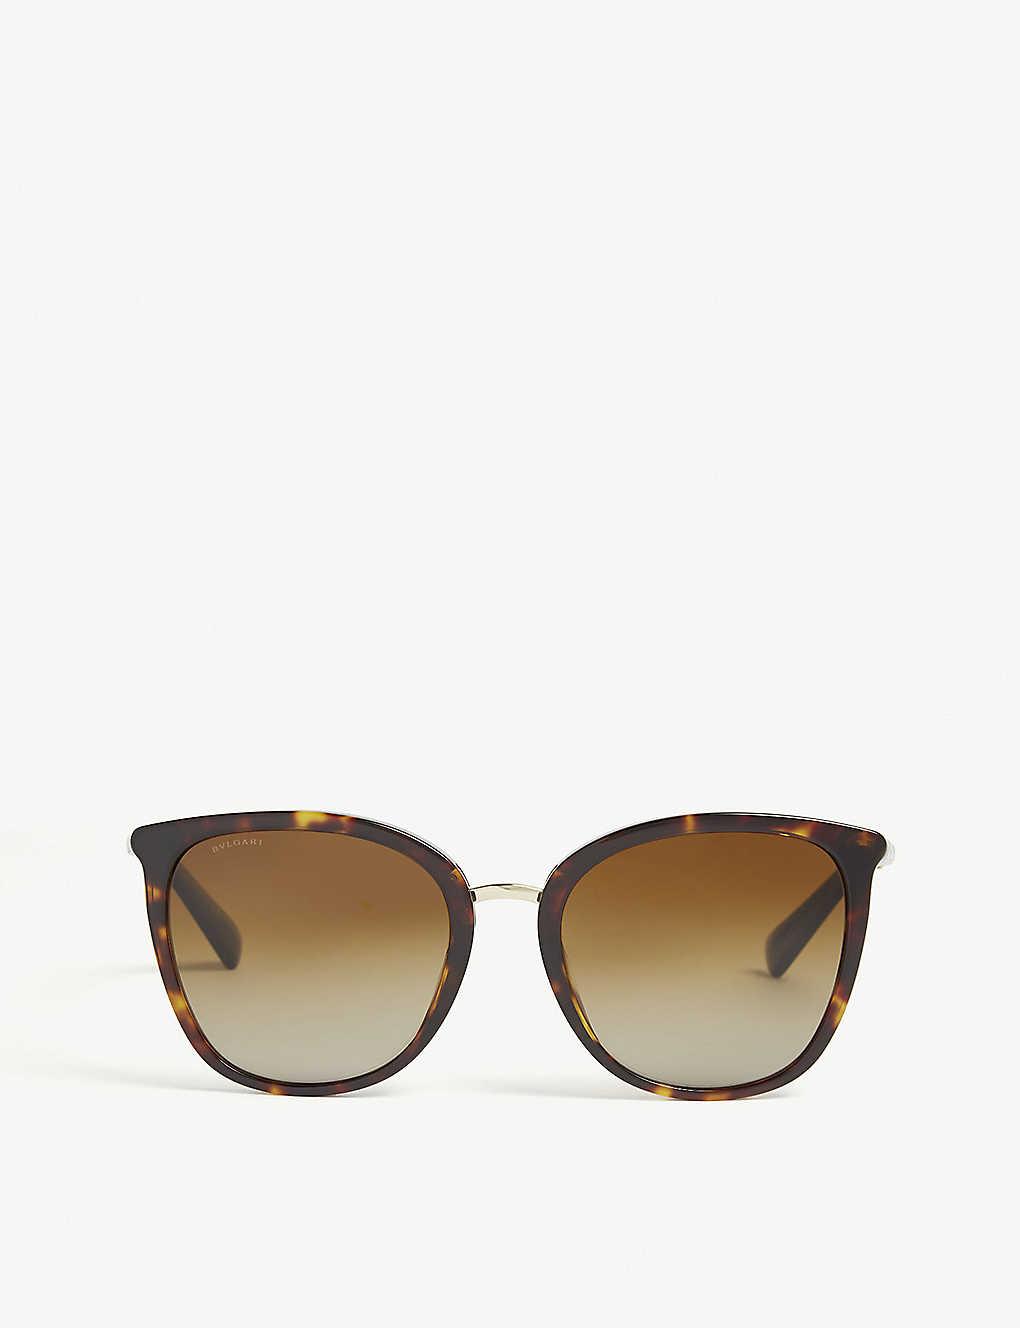 6c06c6f459 BVLGARI - Havana Bv8205kb square-frame sunglasses